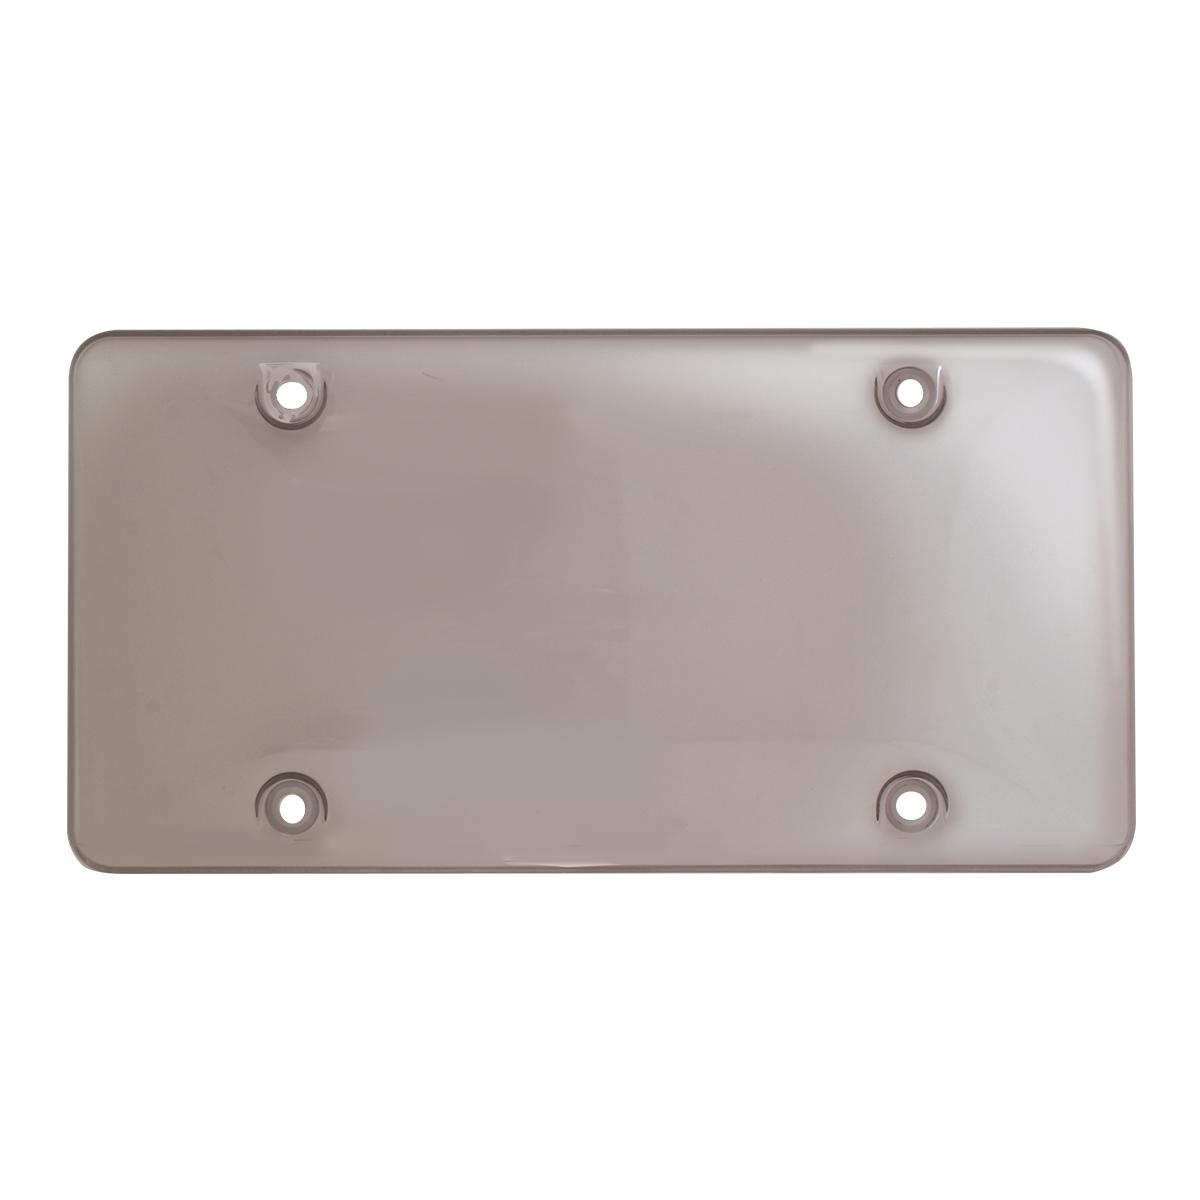 Bubble License Plate Protector - Smoke